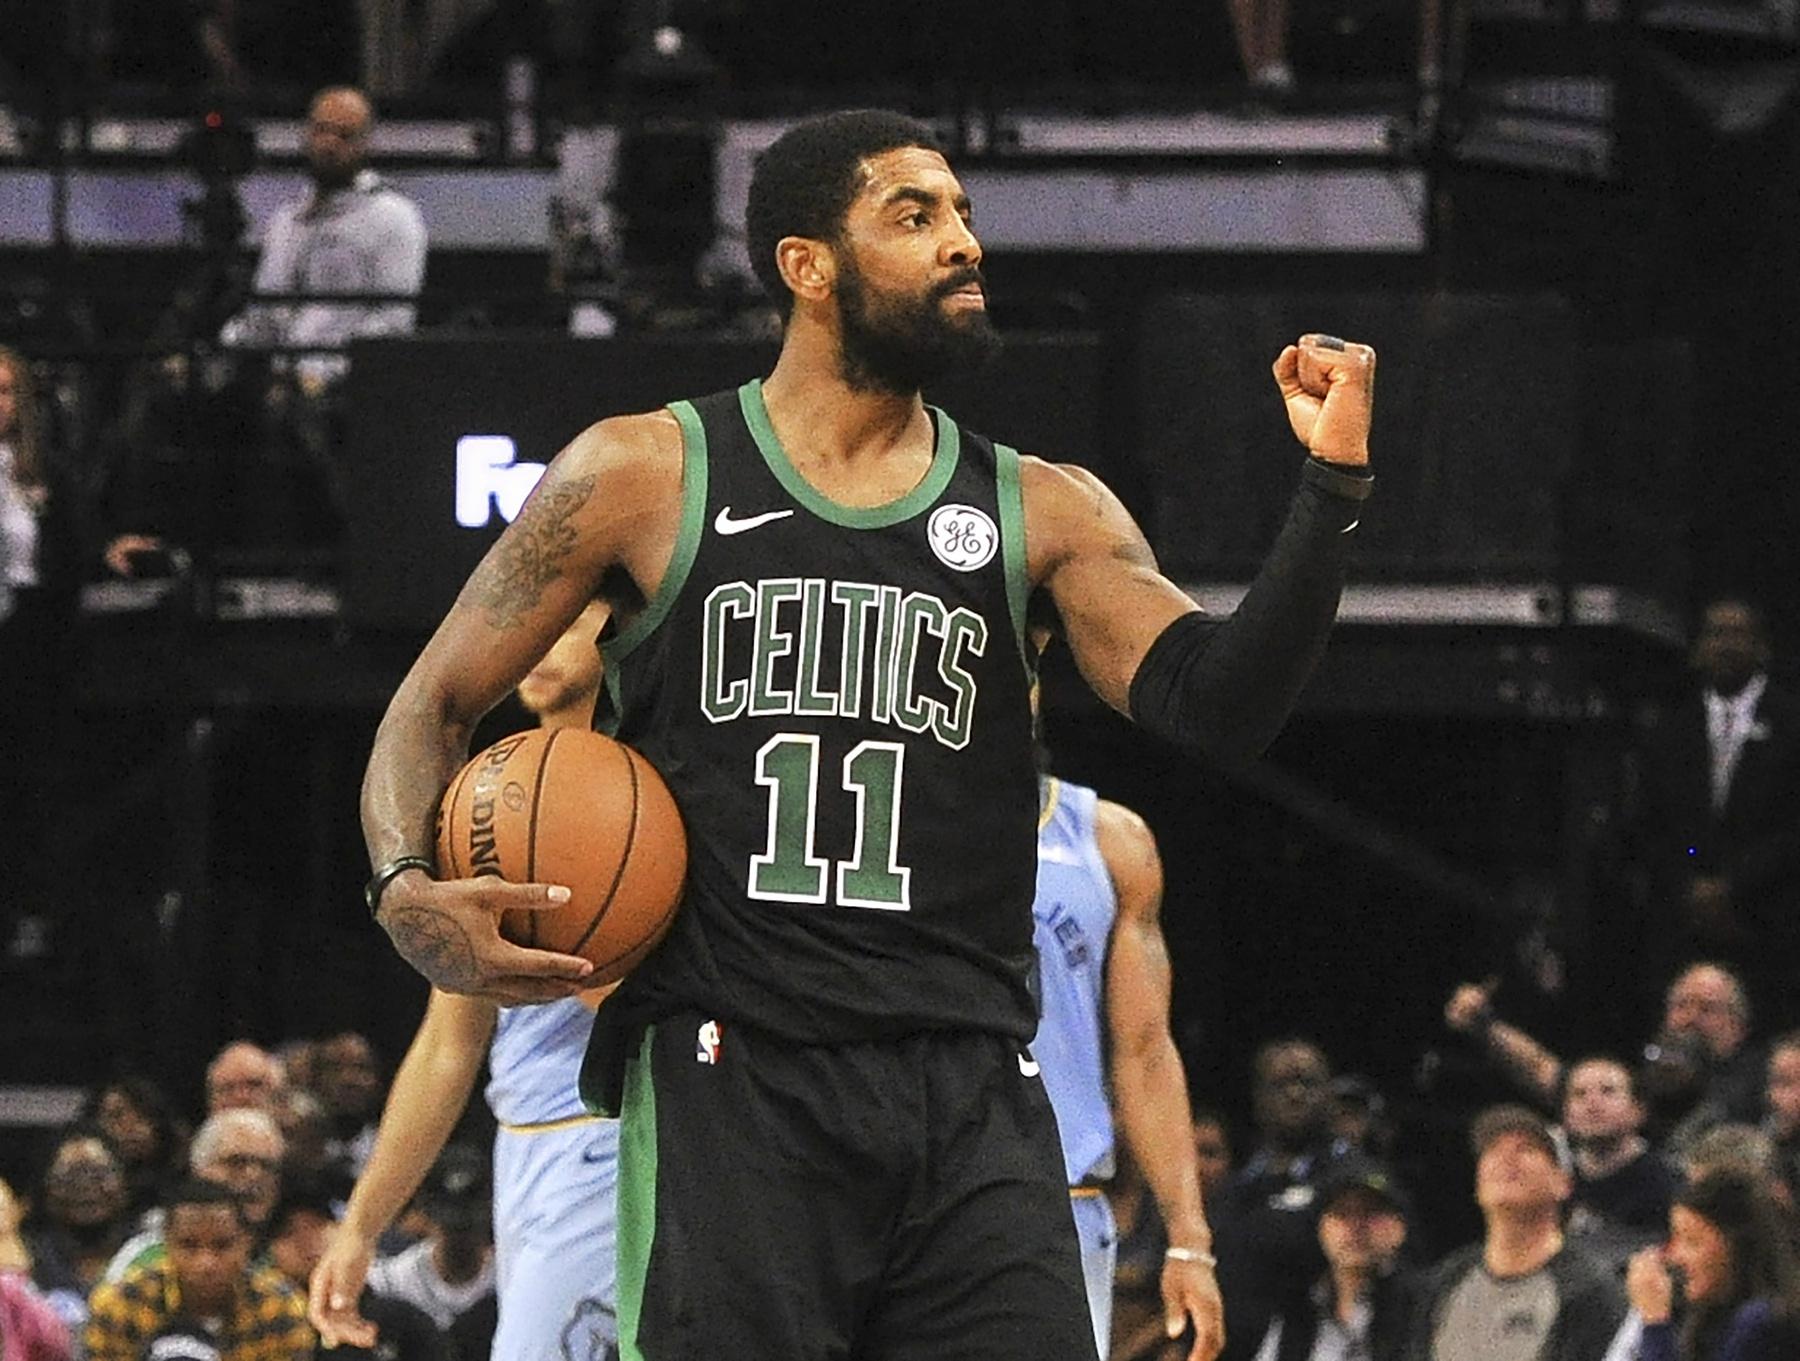 Recap: Celtics finally show grit and balls in comeback win over Memphis